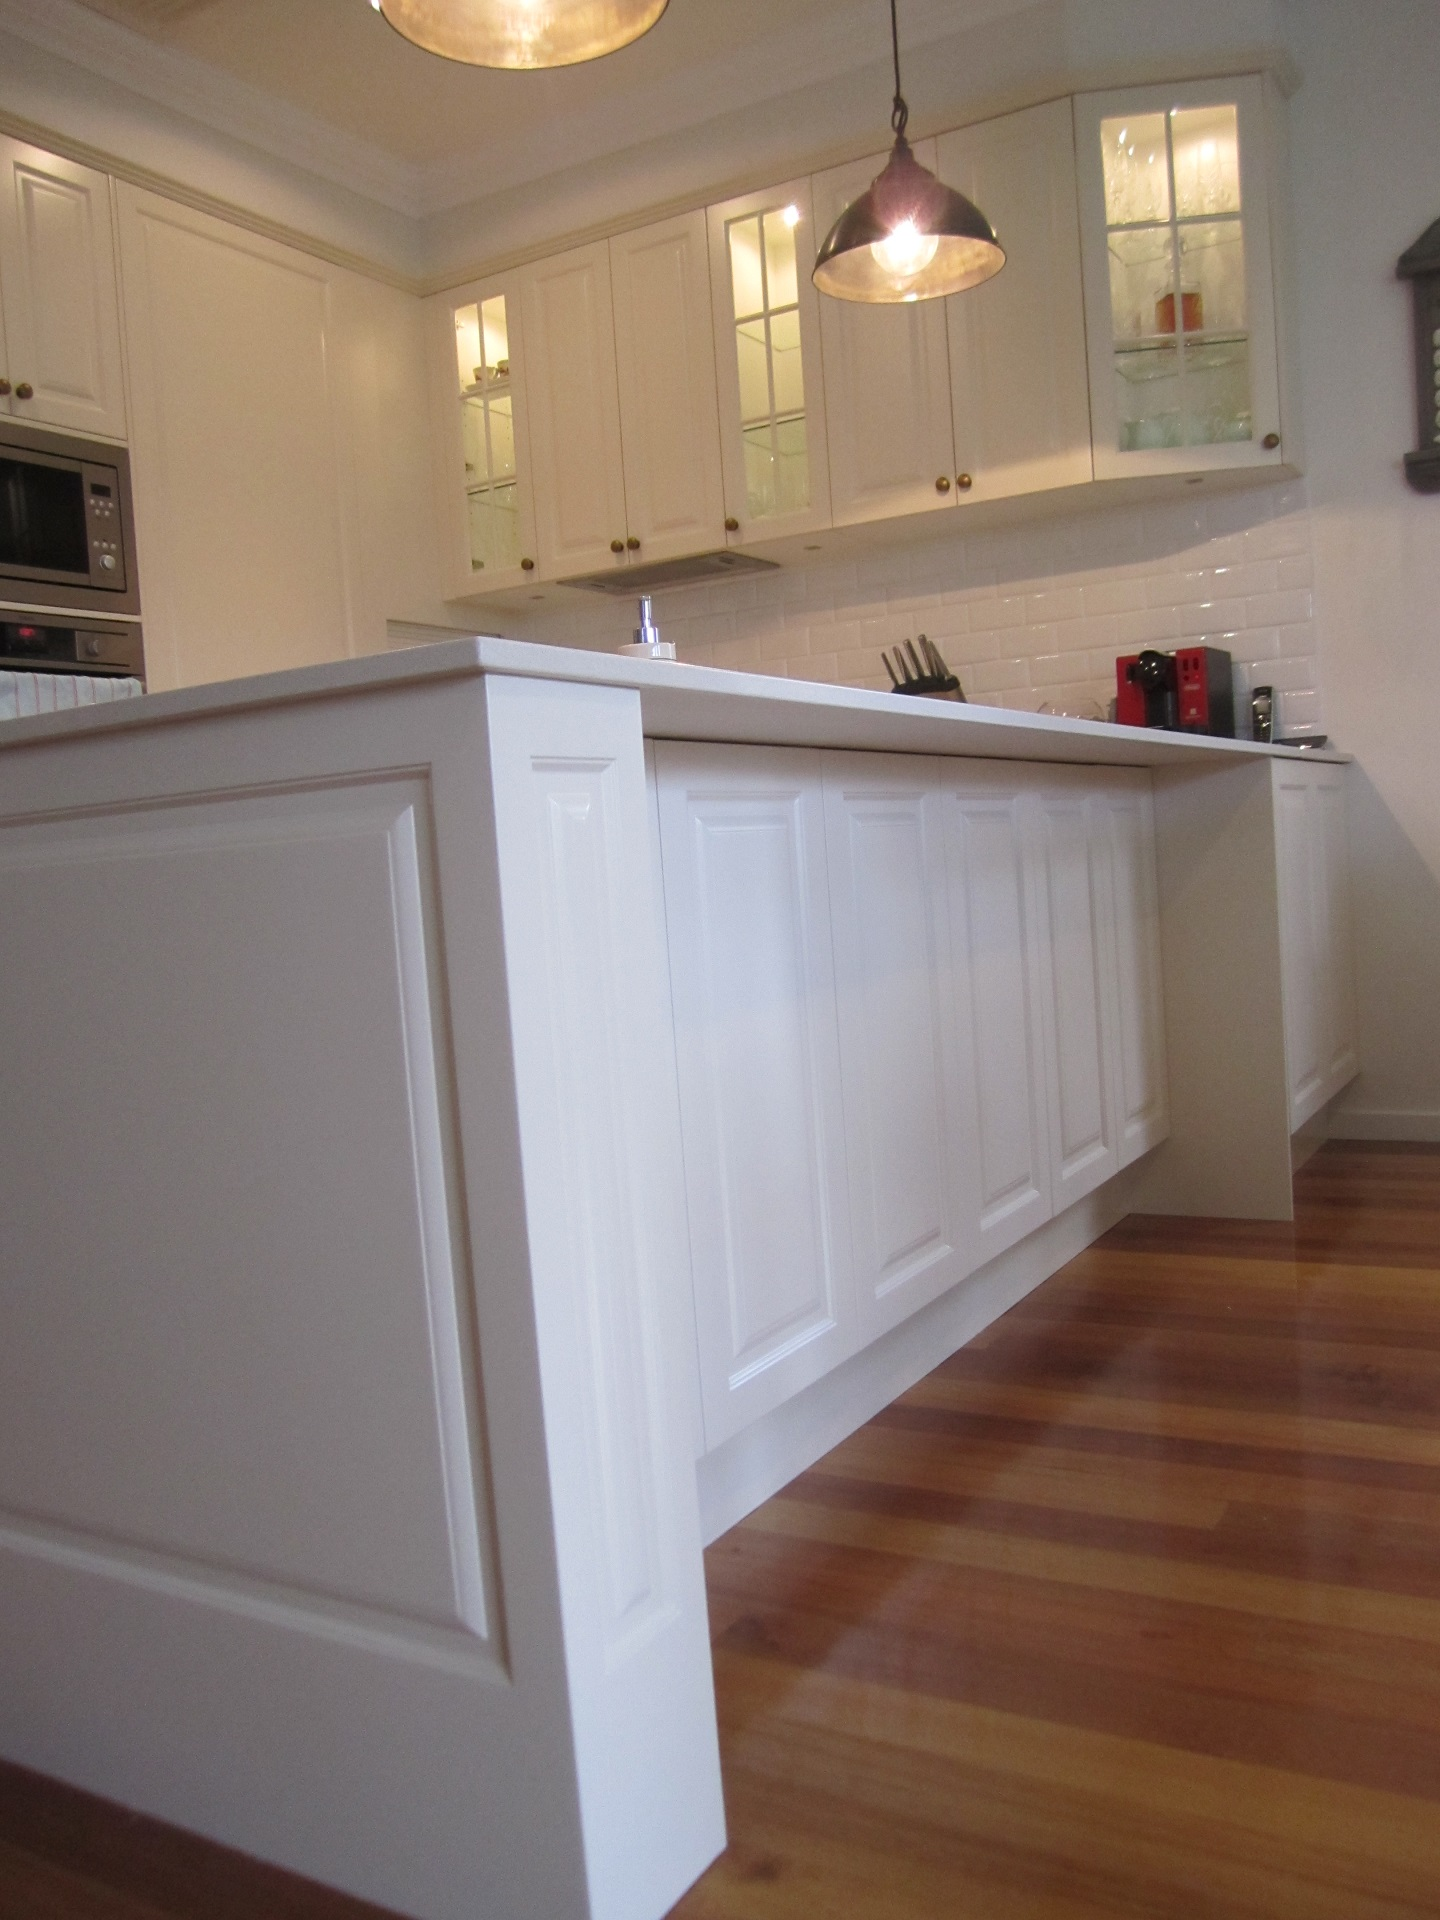 Brisbane Kitchen Design Sydney St Camp Hill  Traditional Kitchen Renovation Island Posts(8)